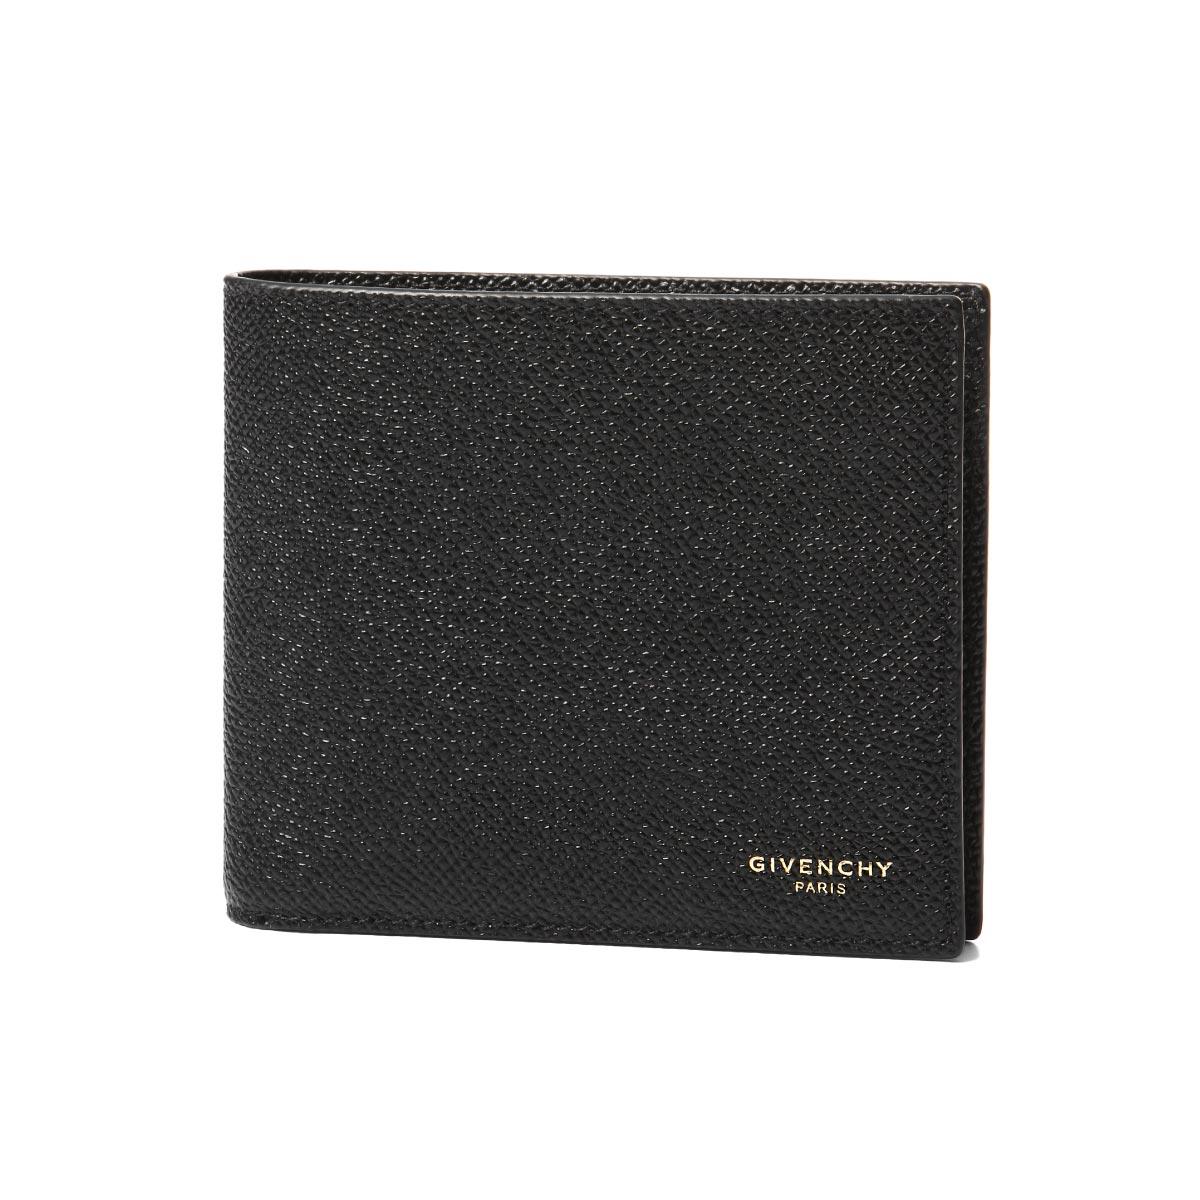 c07e016c Givenchy GIVENCHY wallet men BK06022121 001 folio wallet BLACK black